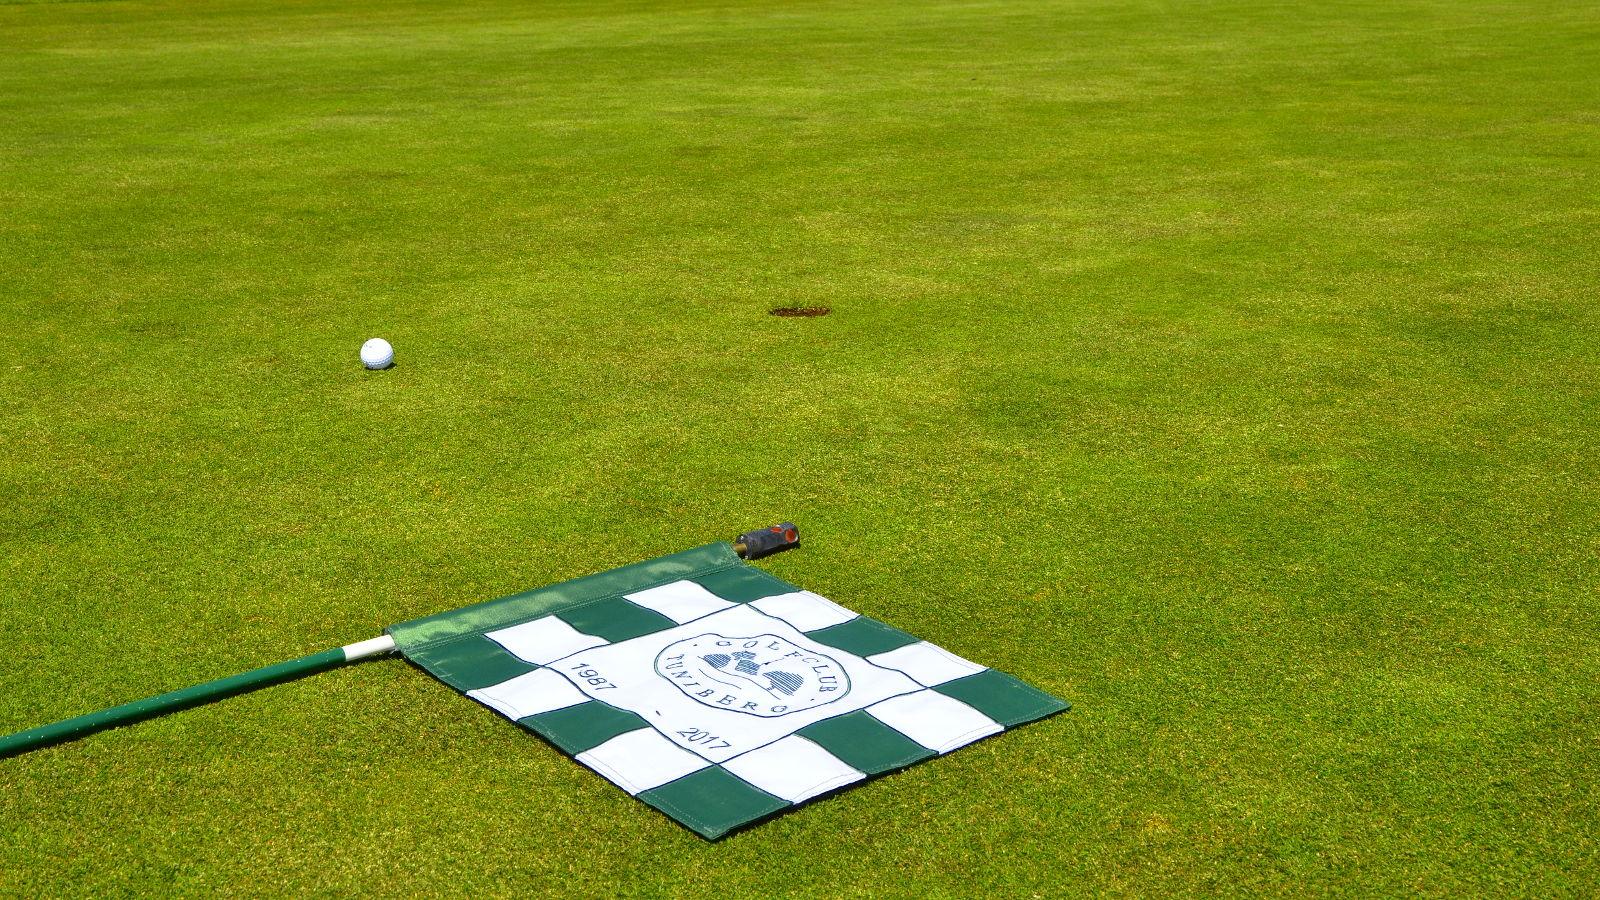 Golfclub Tuniberg Munzingen Jubiläum Fahne